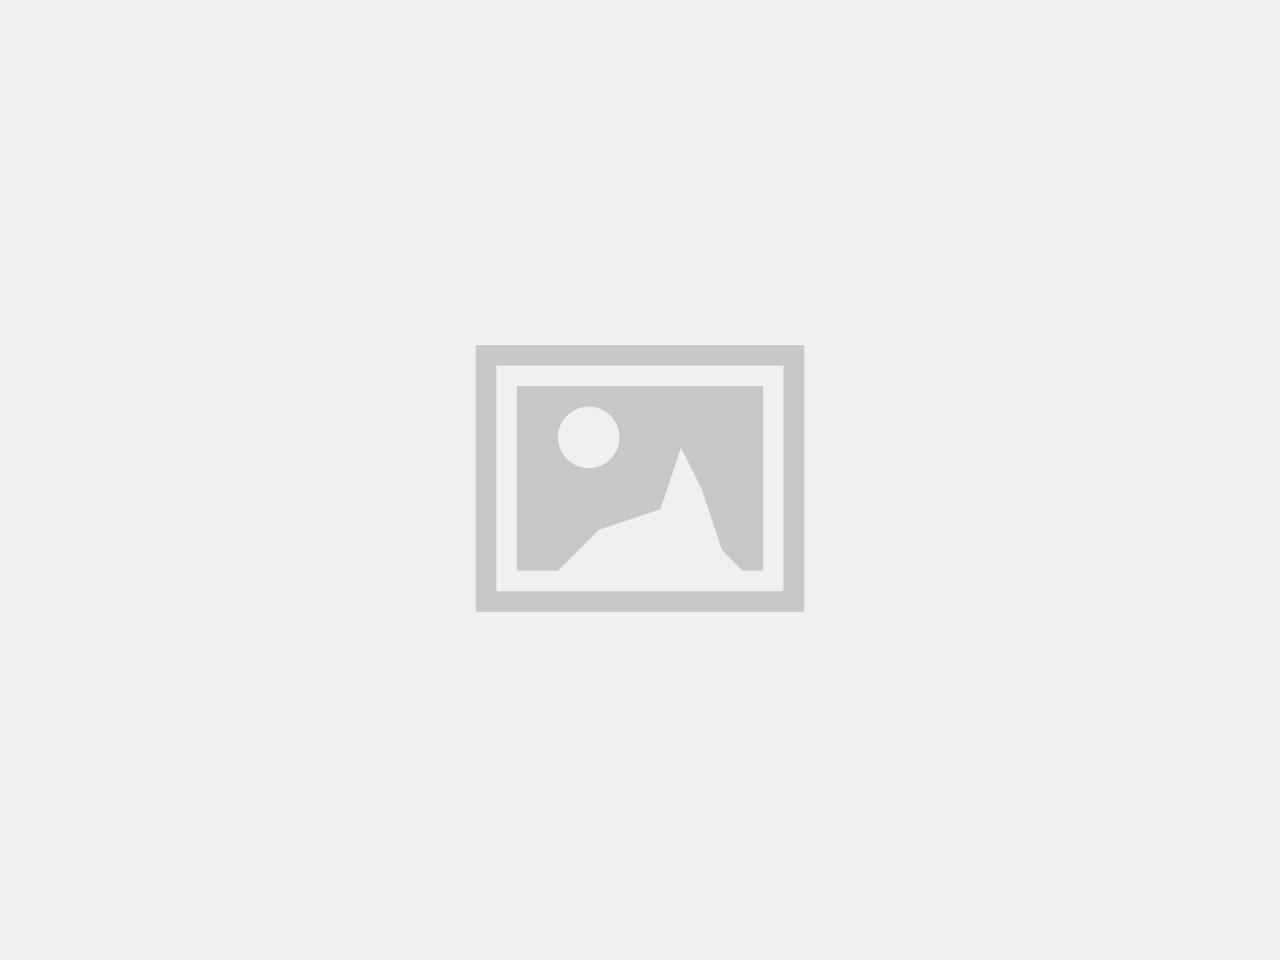 Konor koncentriska (1.4404 Syrafast)